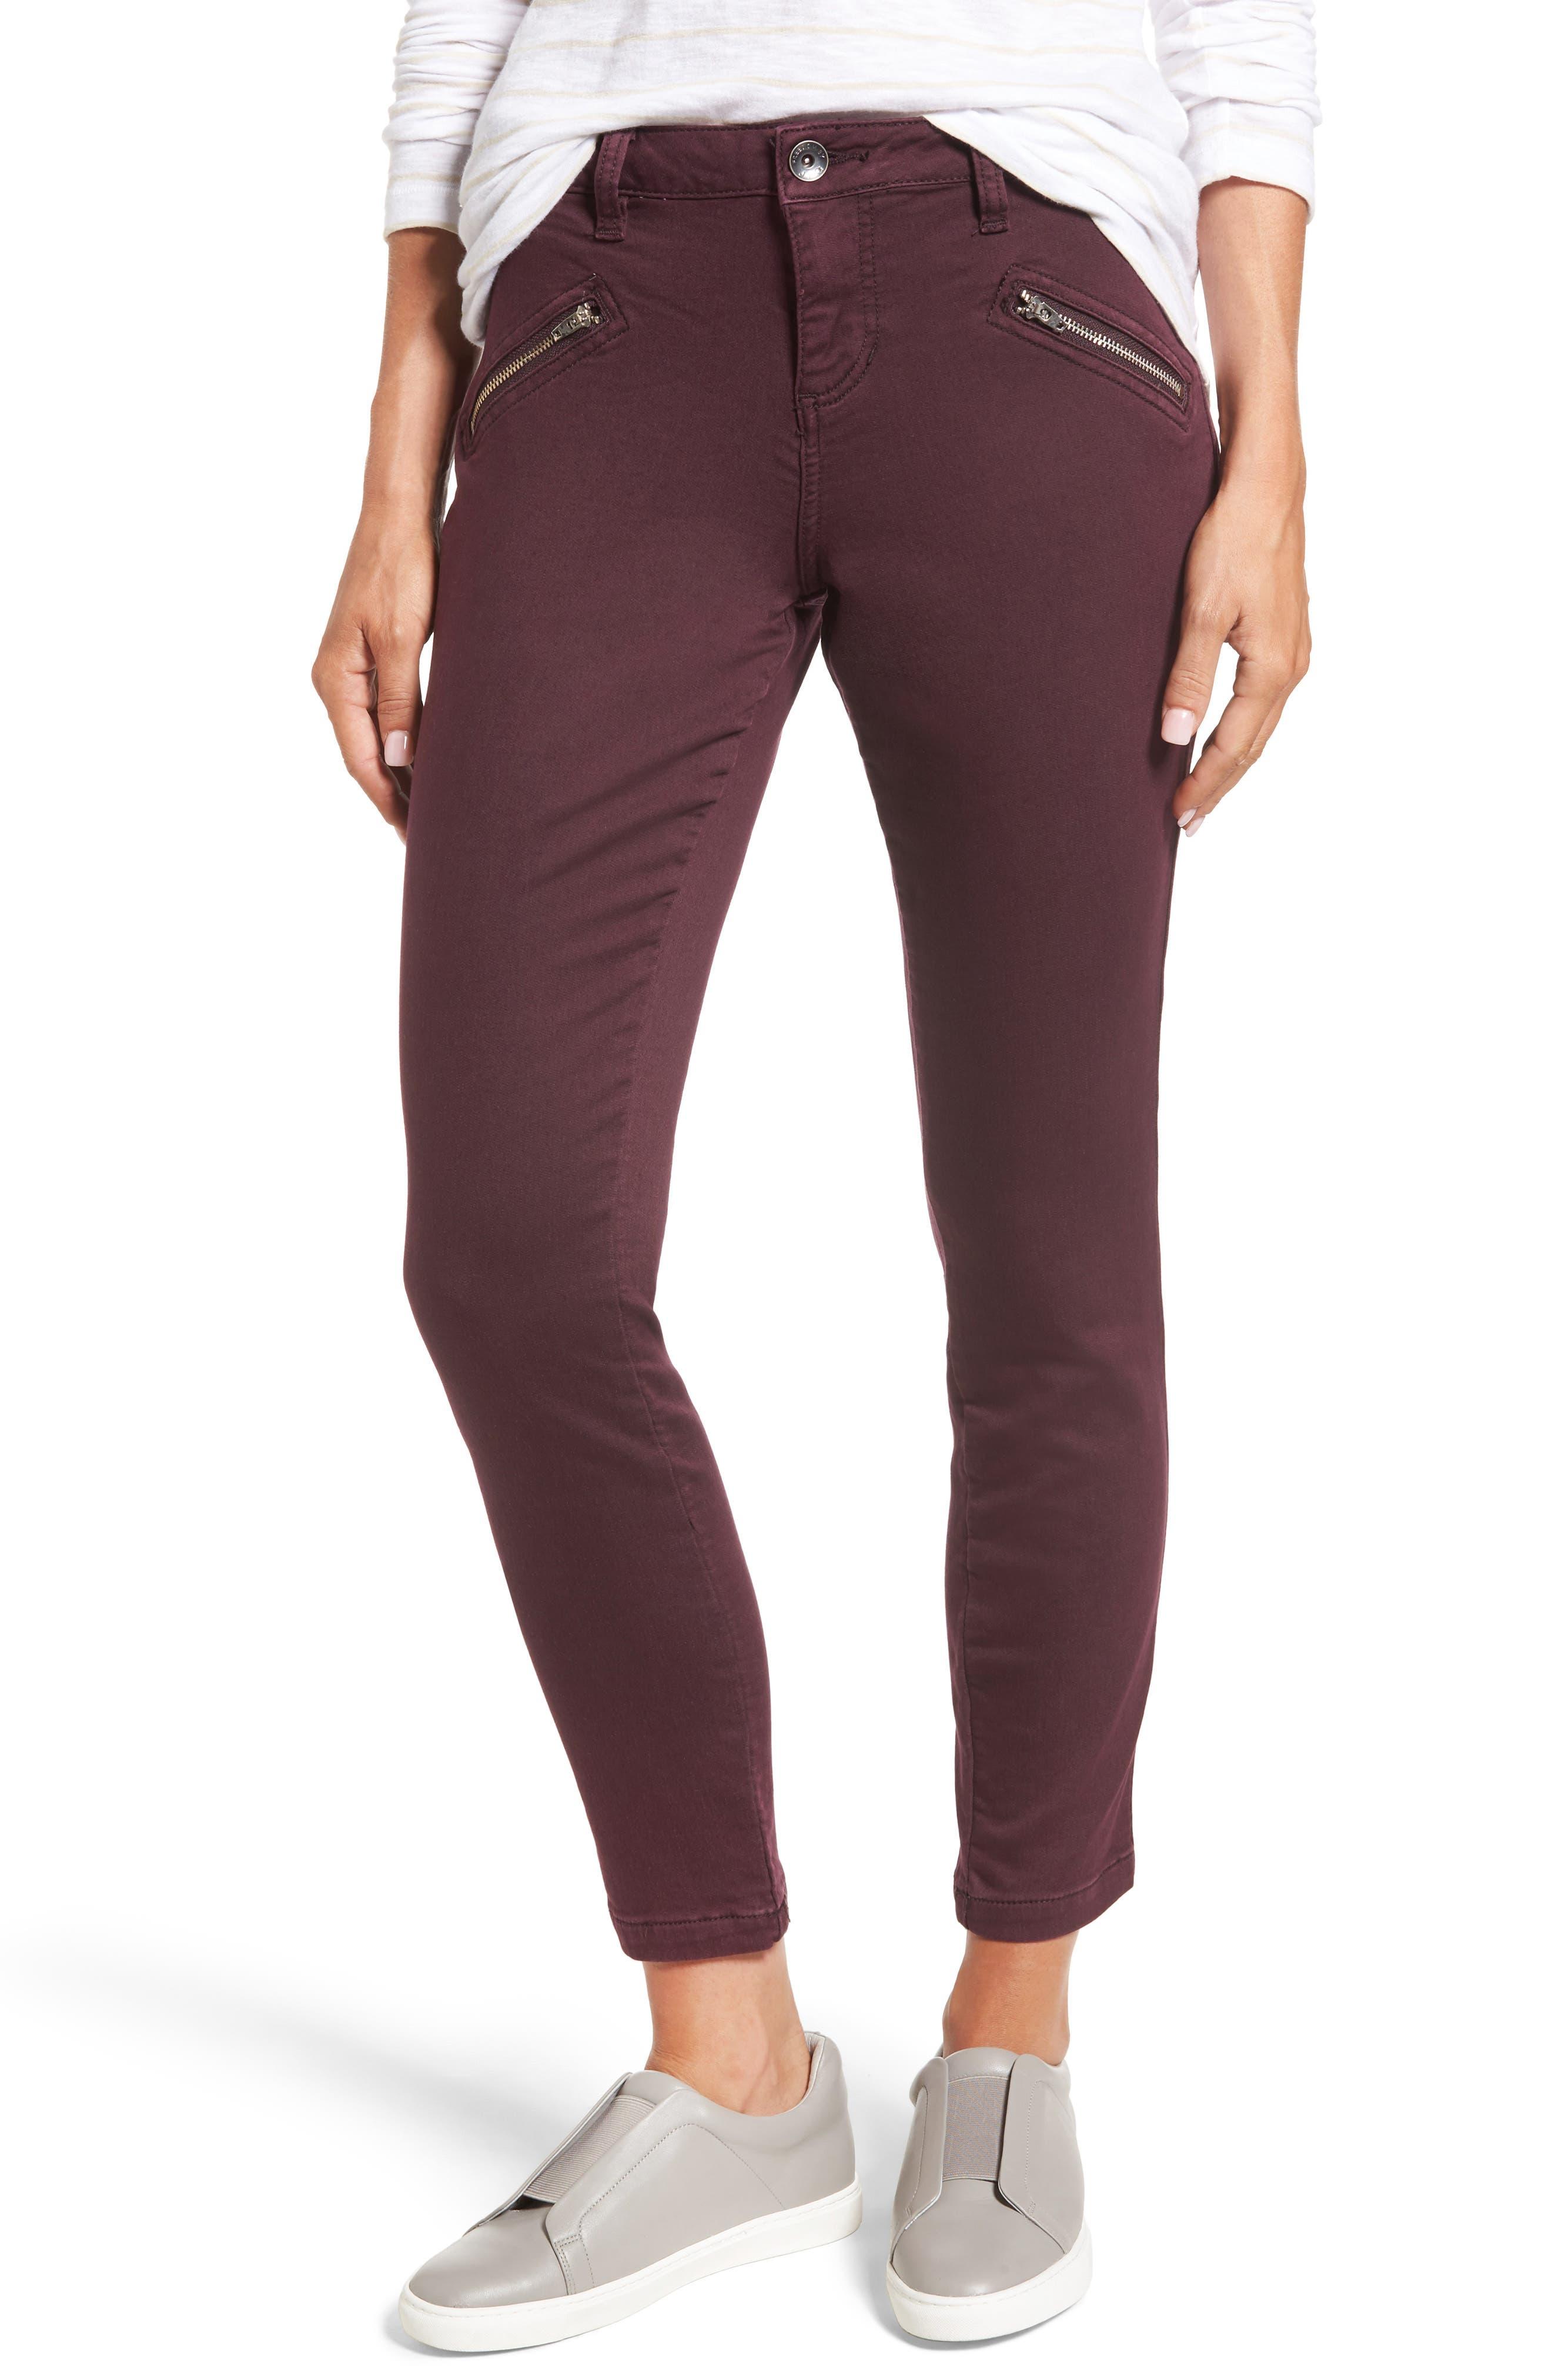 Ryan Knit Skinny Jeans,                             Main thumbnail 1, color,                             575